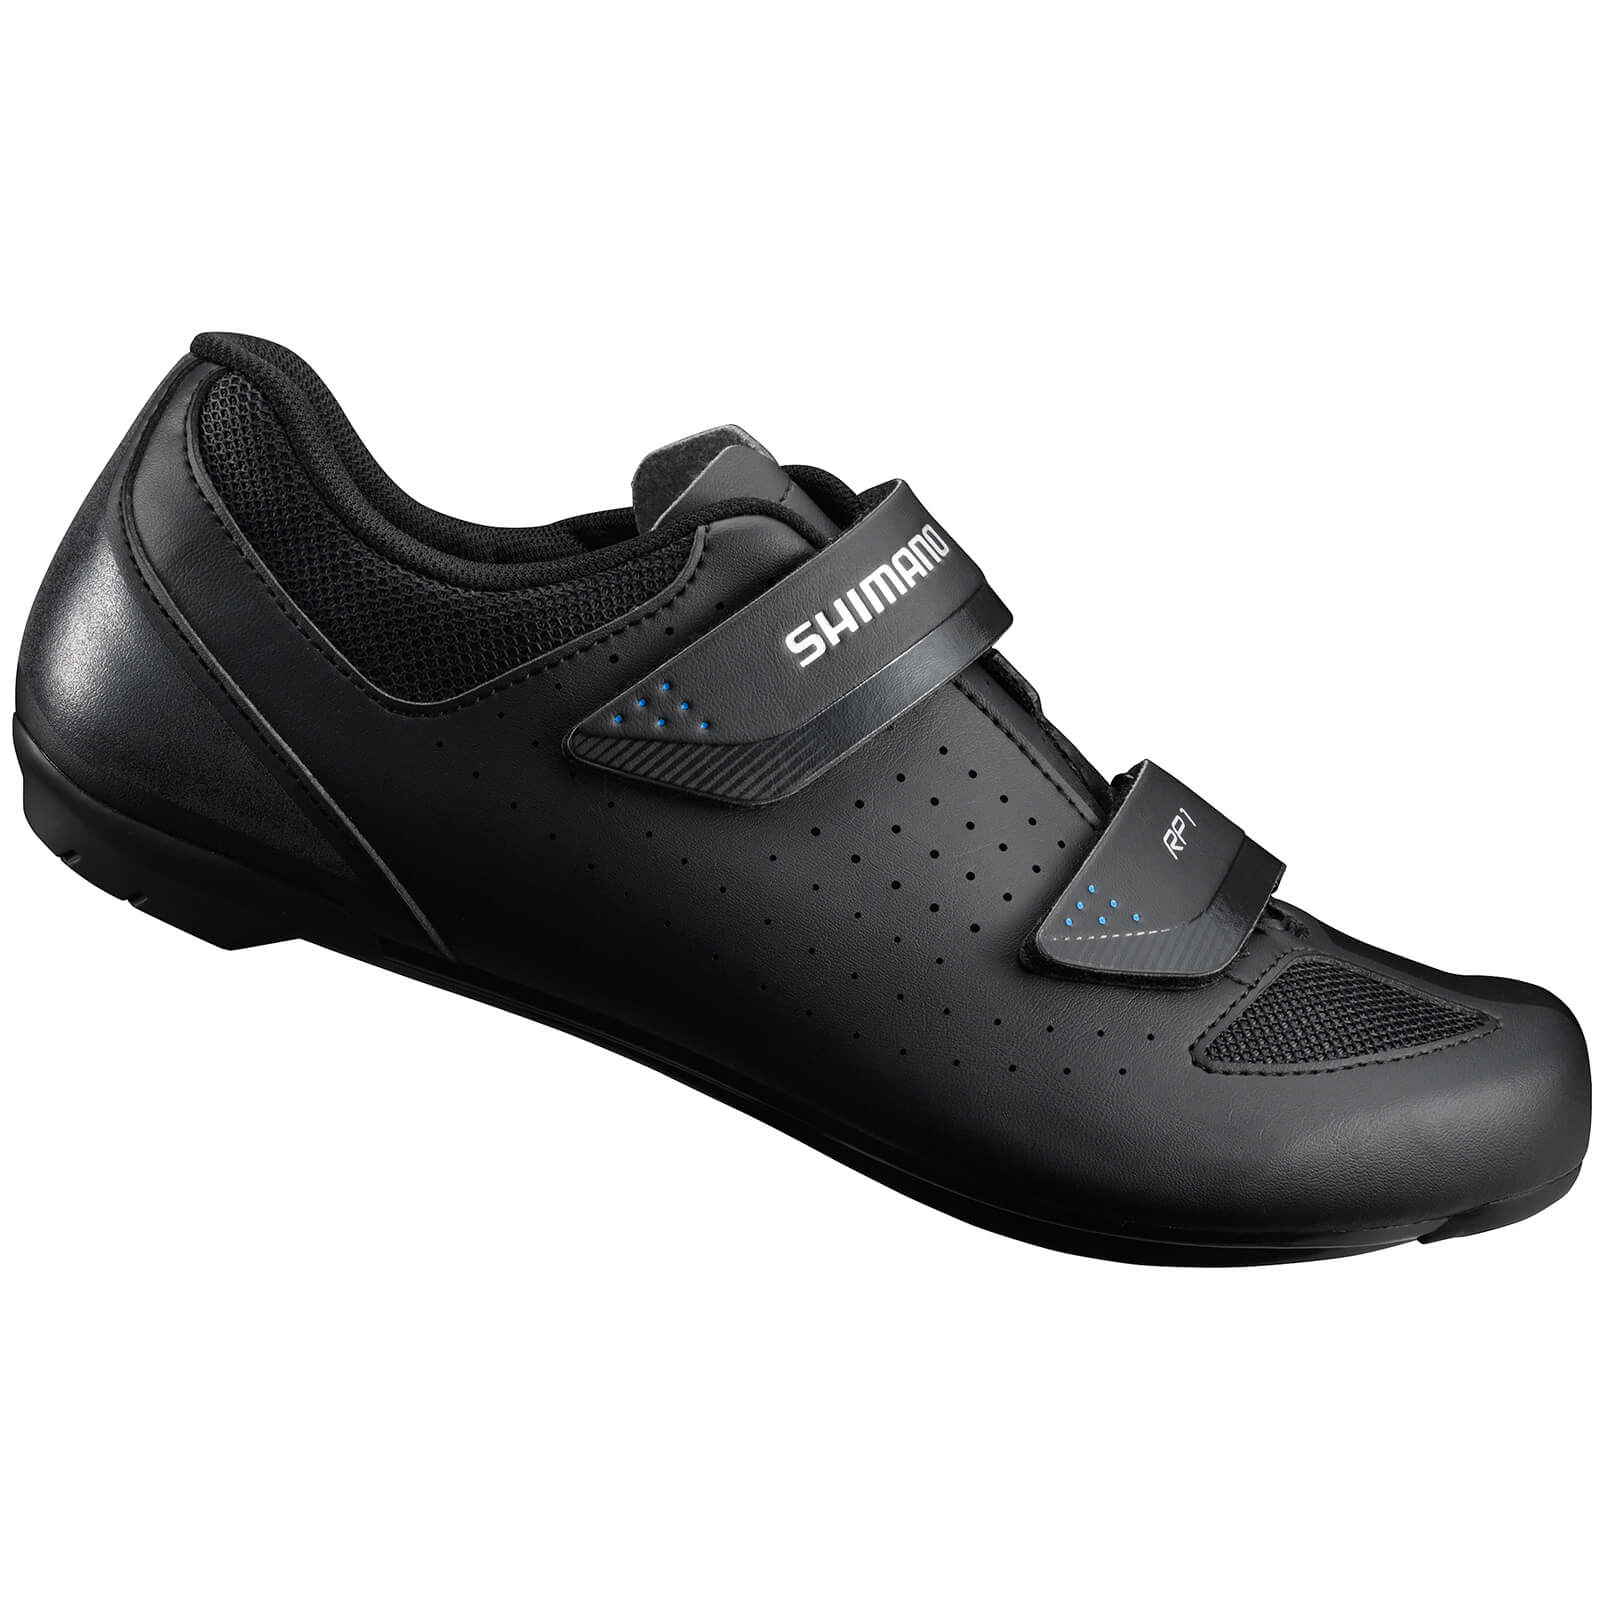 Shimano RP1 Road Shoes - Black - UK 2.5/EU 36 - Black